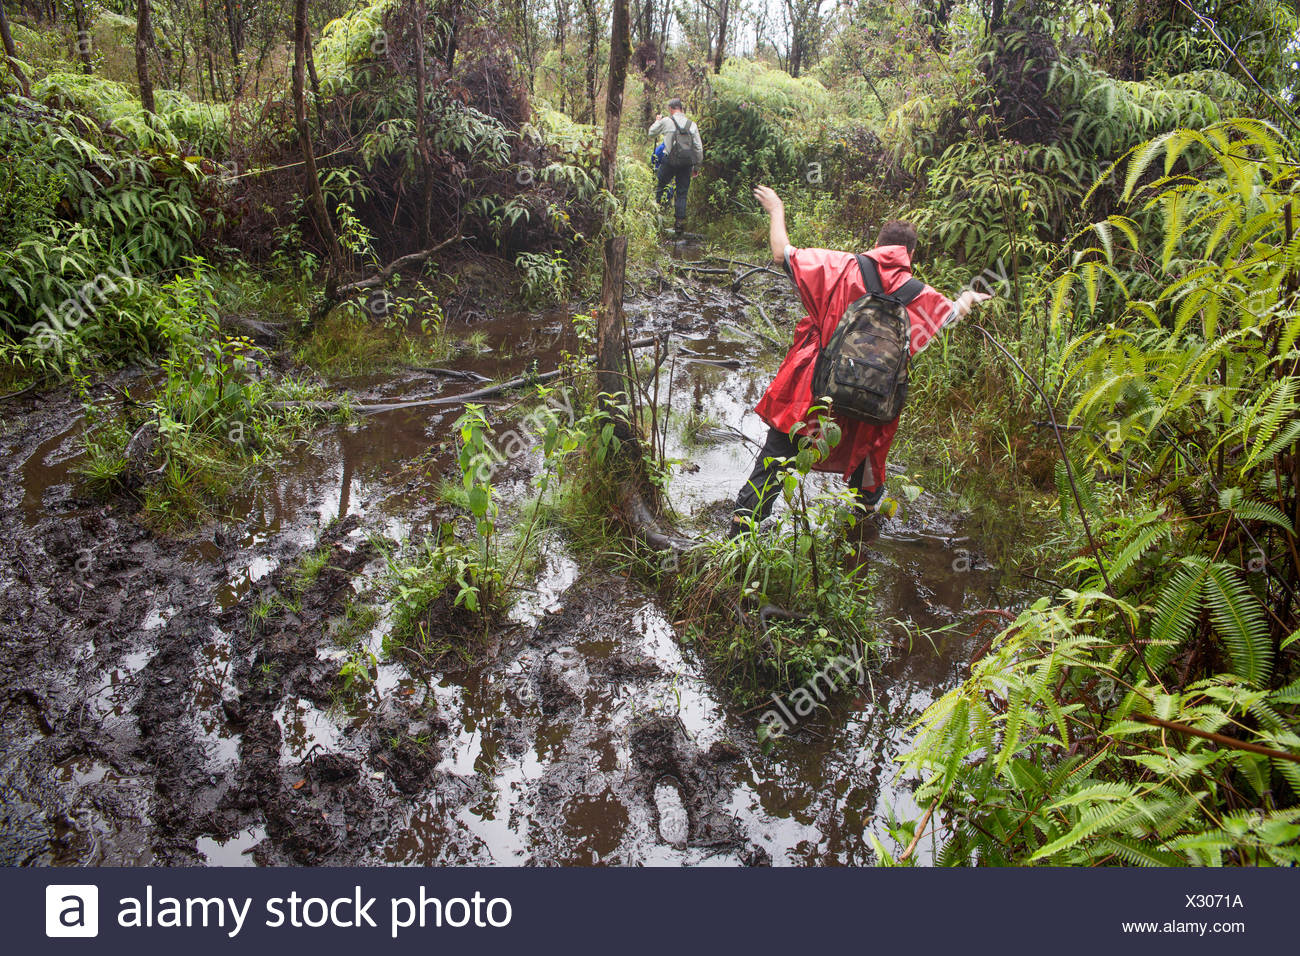 Big Island,hiking,rain forest,Kahaualea Natural aera reserve,reserve,Vulcanoes,National Park,Big Island,USA,Hawaii,Ame - Stock Image